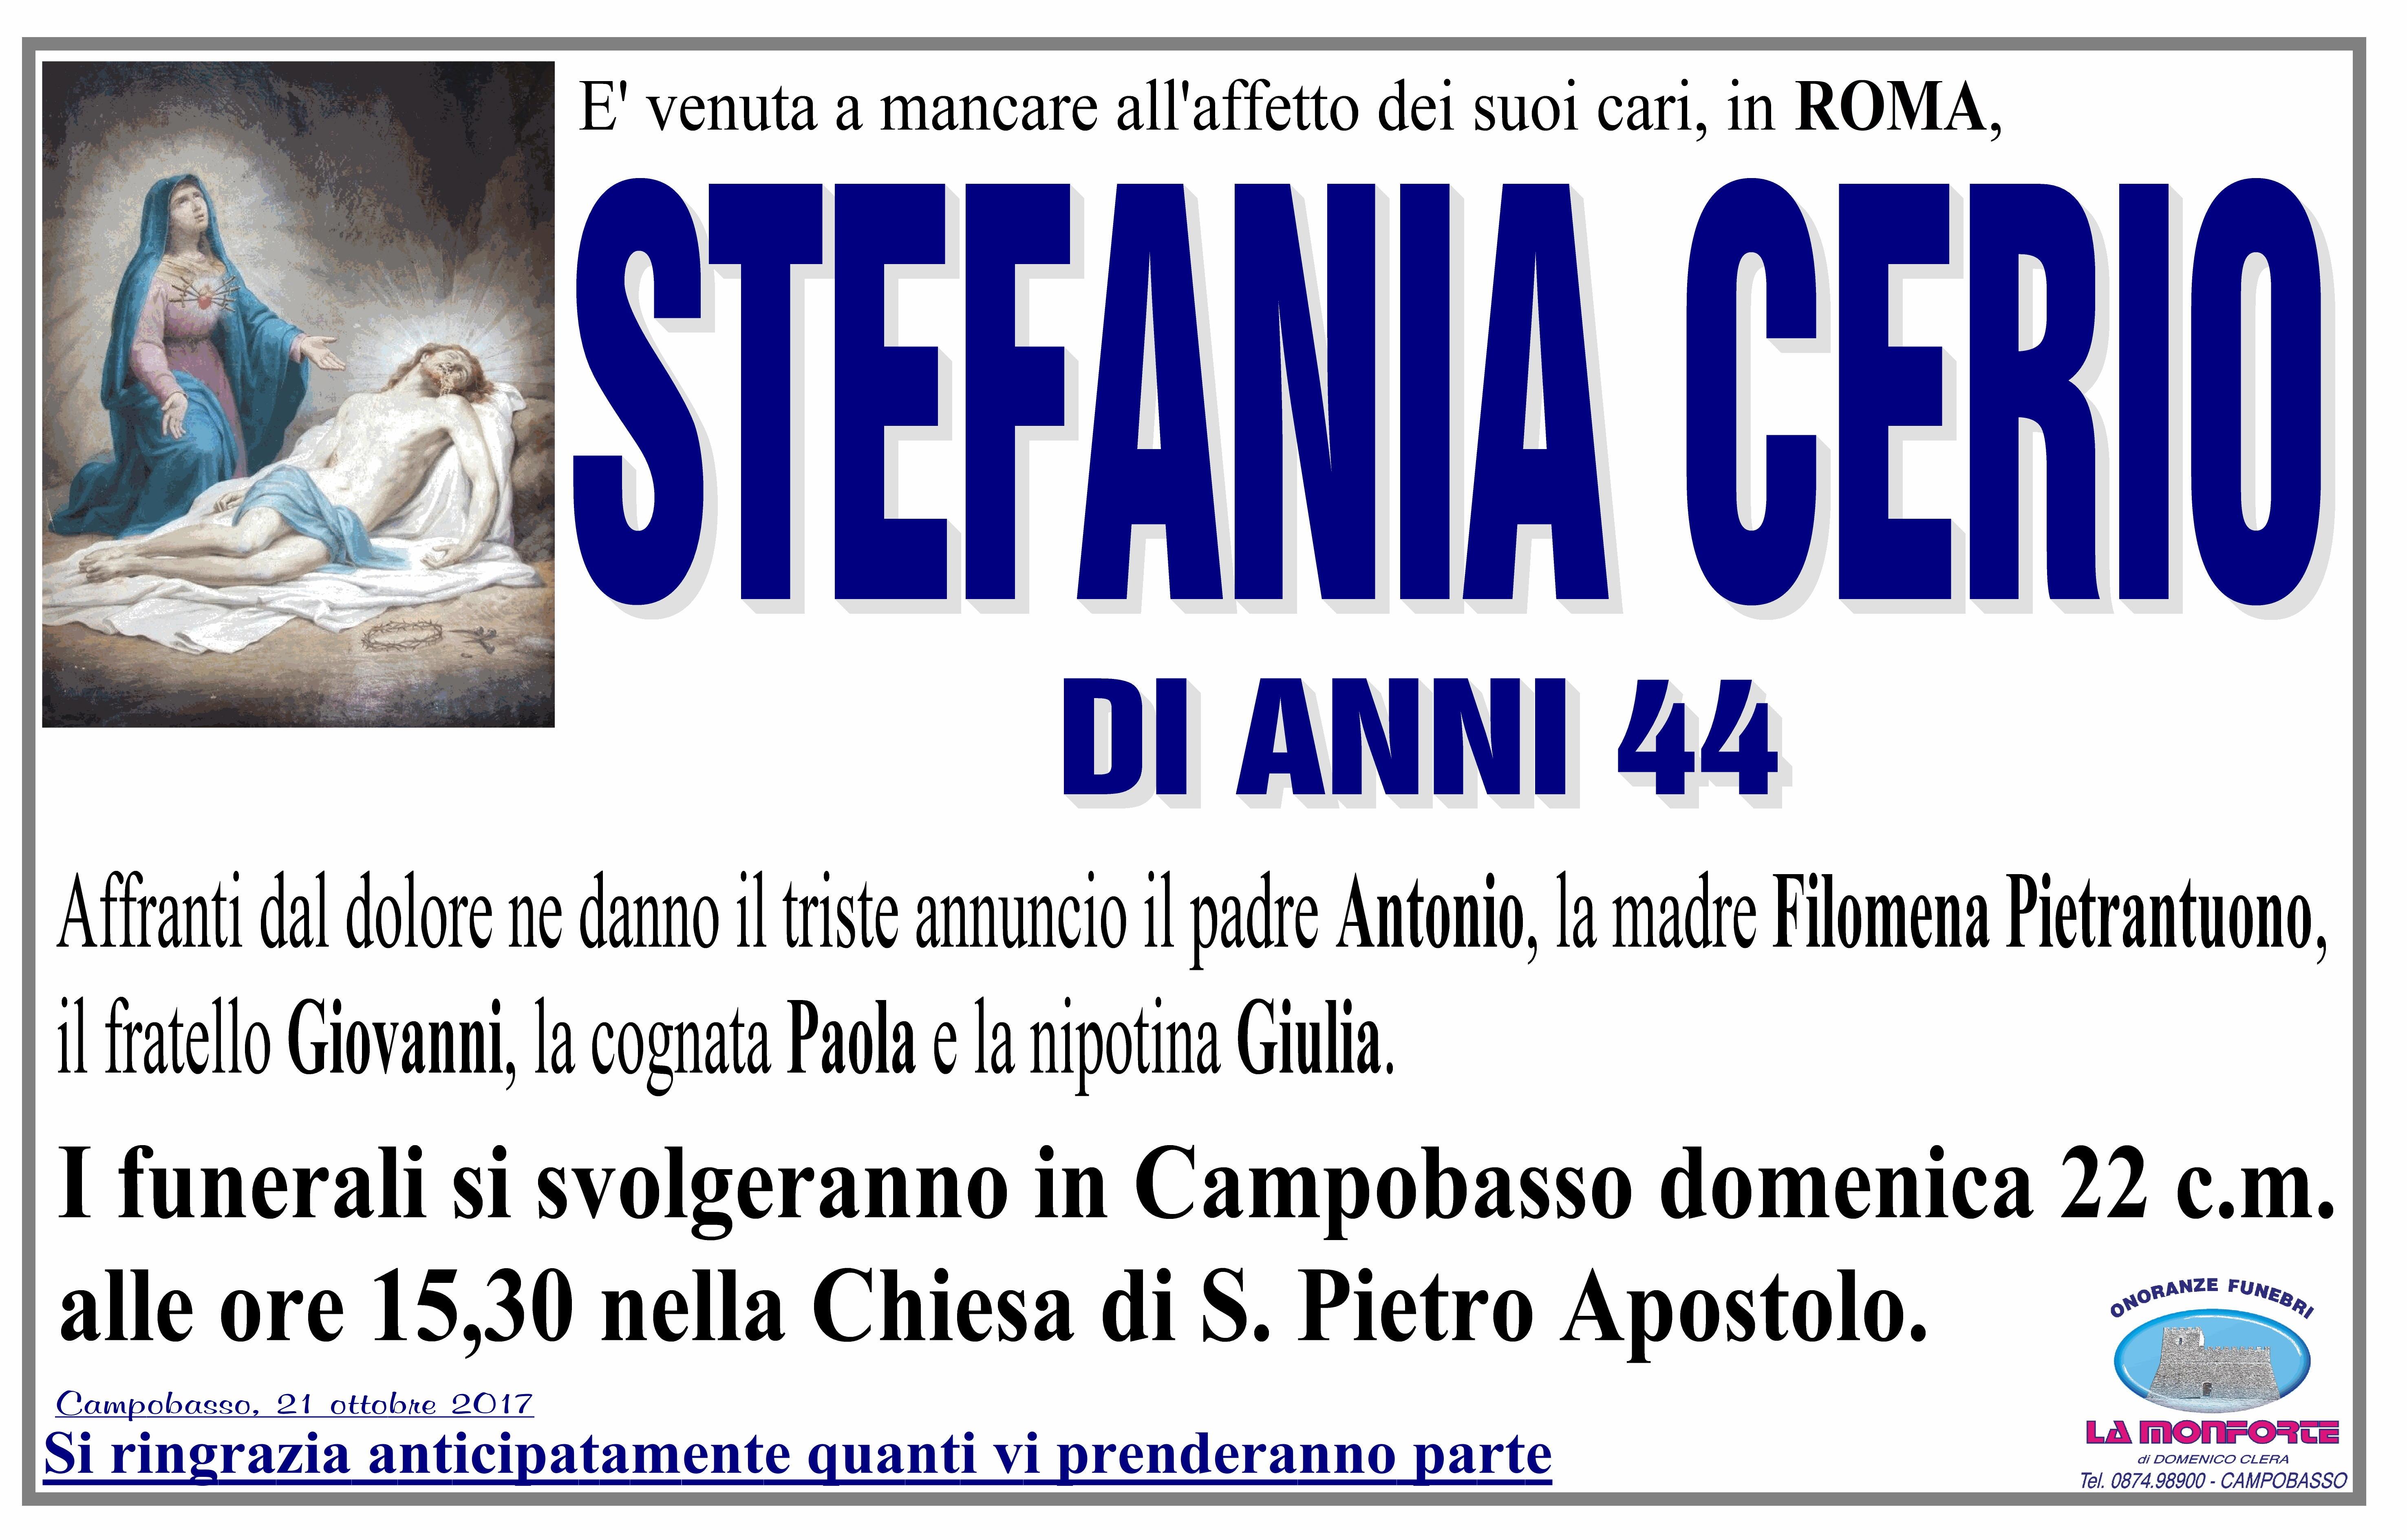 Stefania Cerio, 21/10/2017, Campobasso – Onoranze Funebri La Monforte